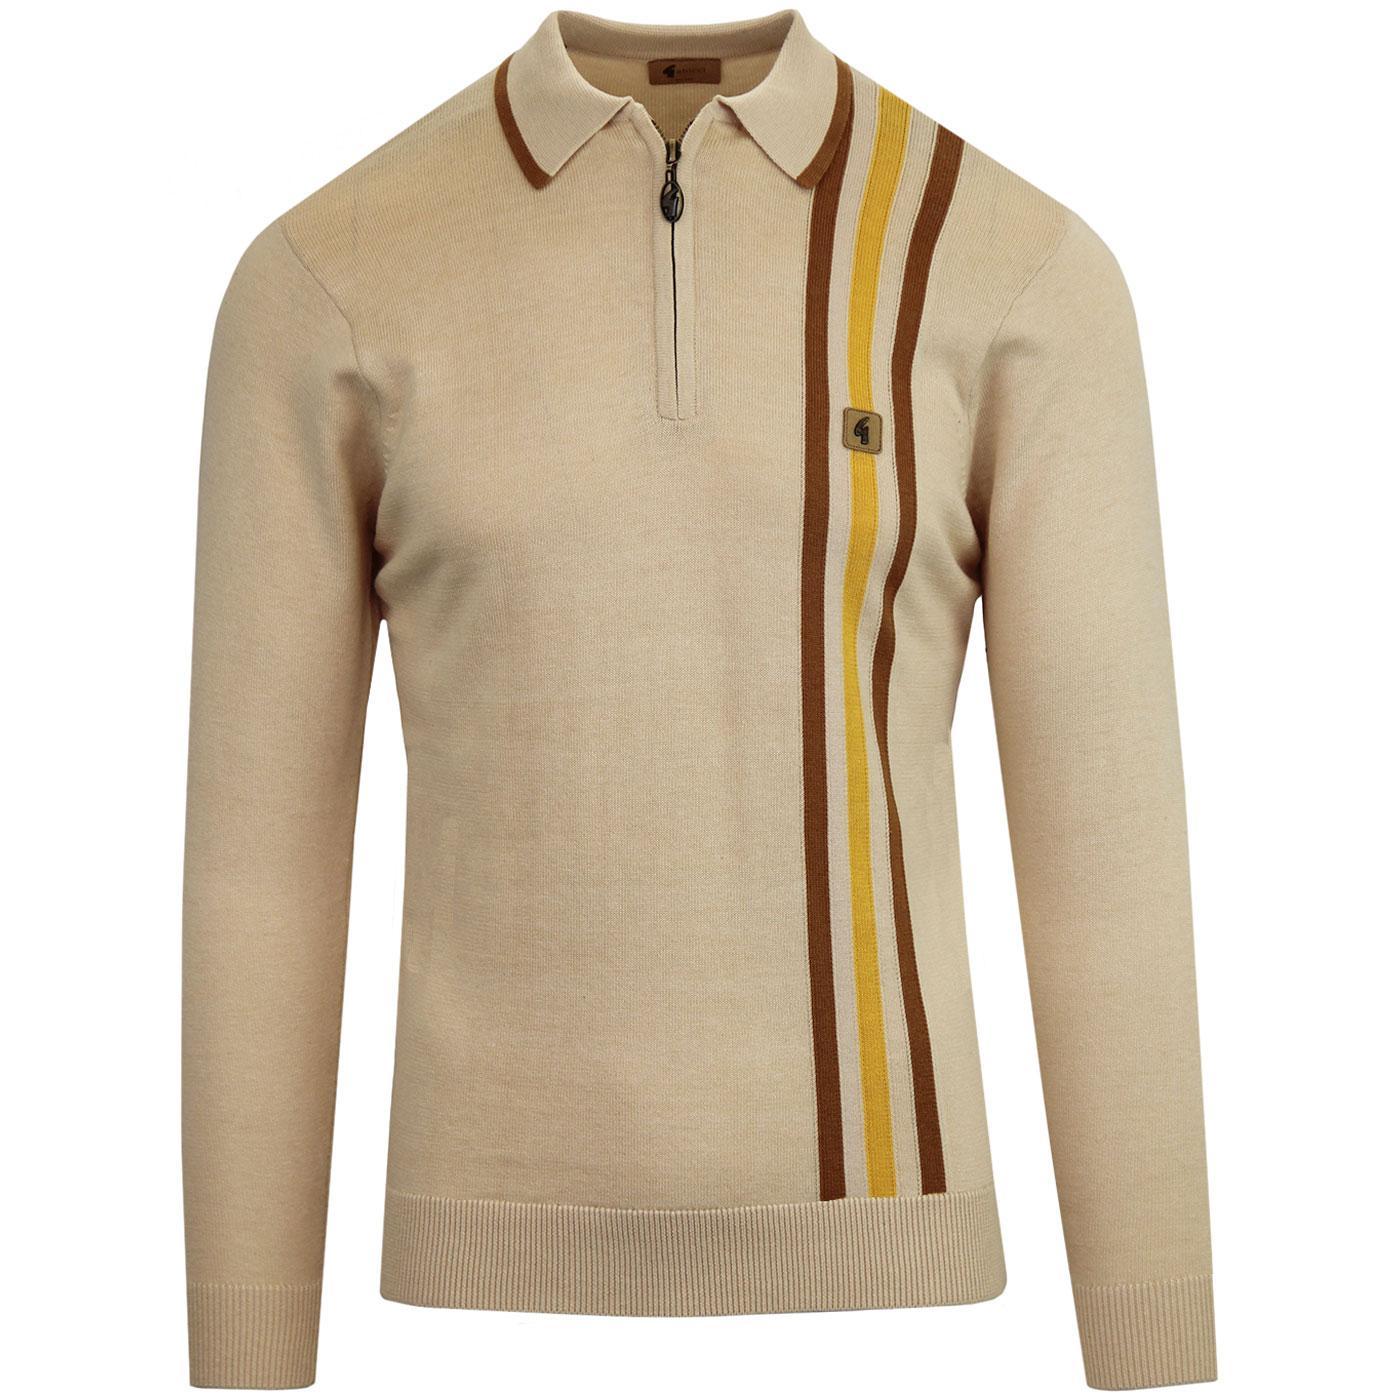 Blade GABICCI VINTAGE 60s Mod Stripe Knit Polo OAT